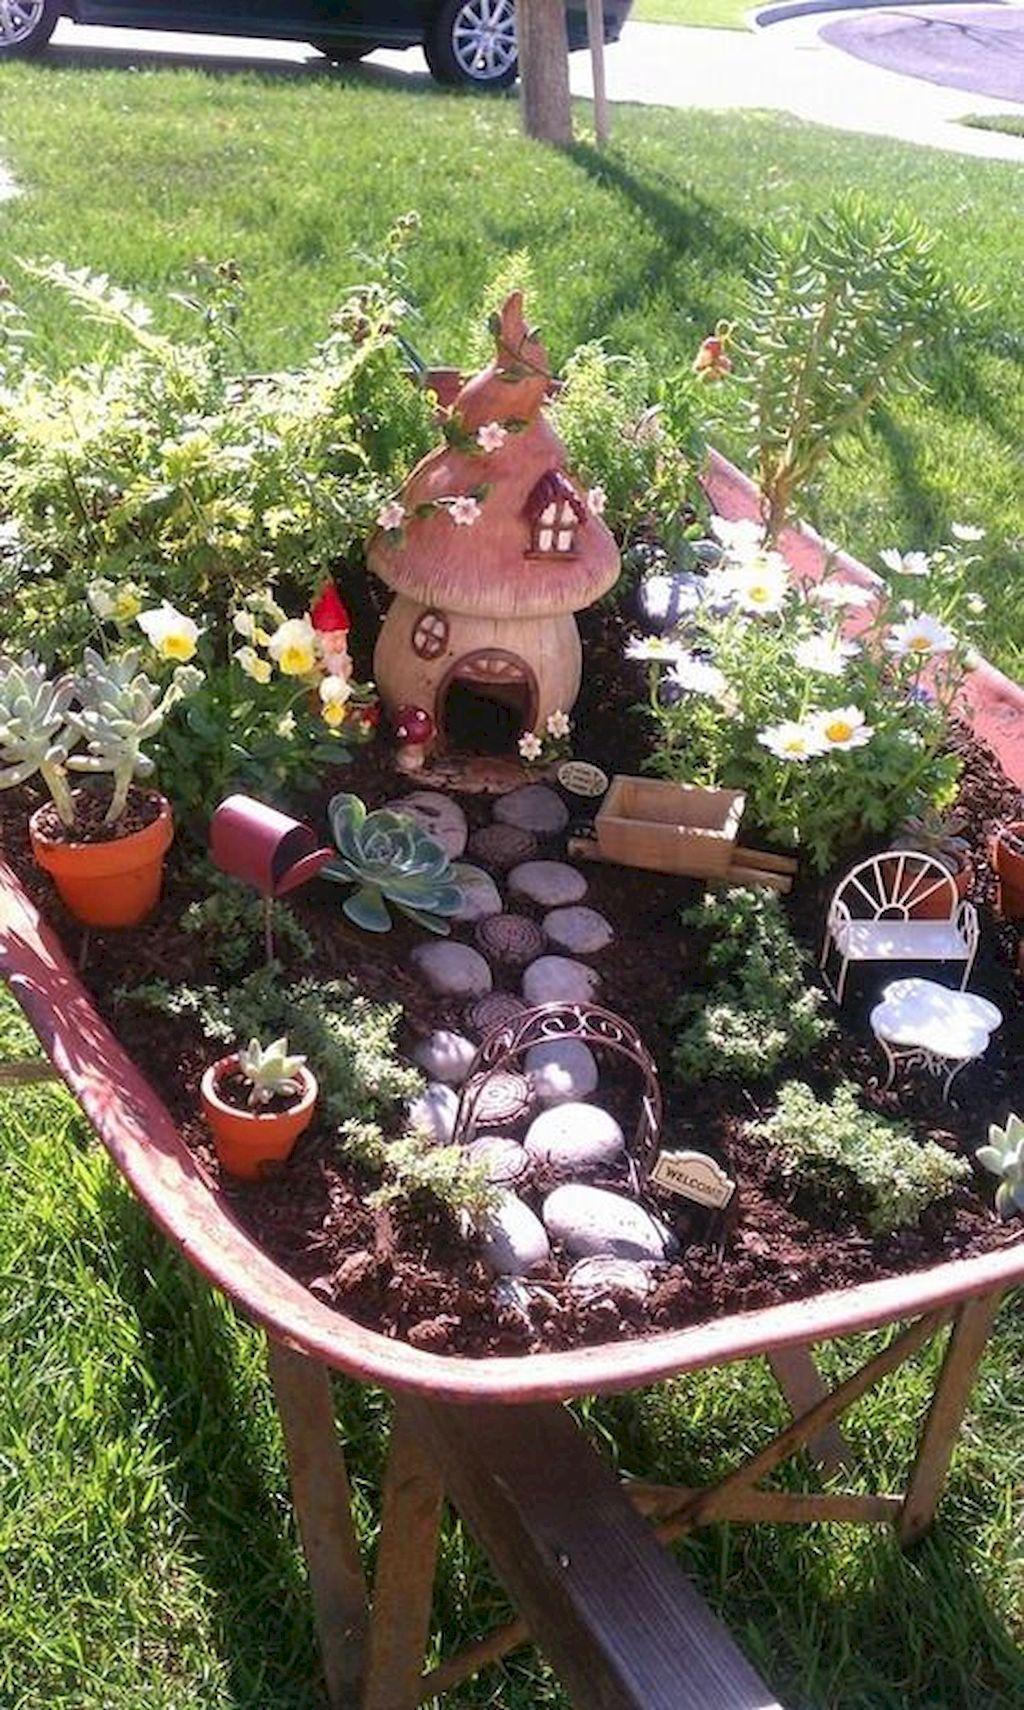 Magnificent diy fairy garden ideas (6 - Fairy garden decor, Fairy garden diy, Fairy garden designs, Mini fairy garden, Fairy garden houses, Fairy garden - Magnificent diy fairy garden ideas (6)